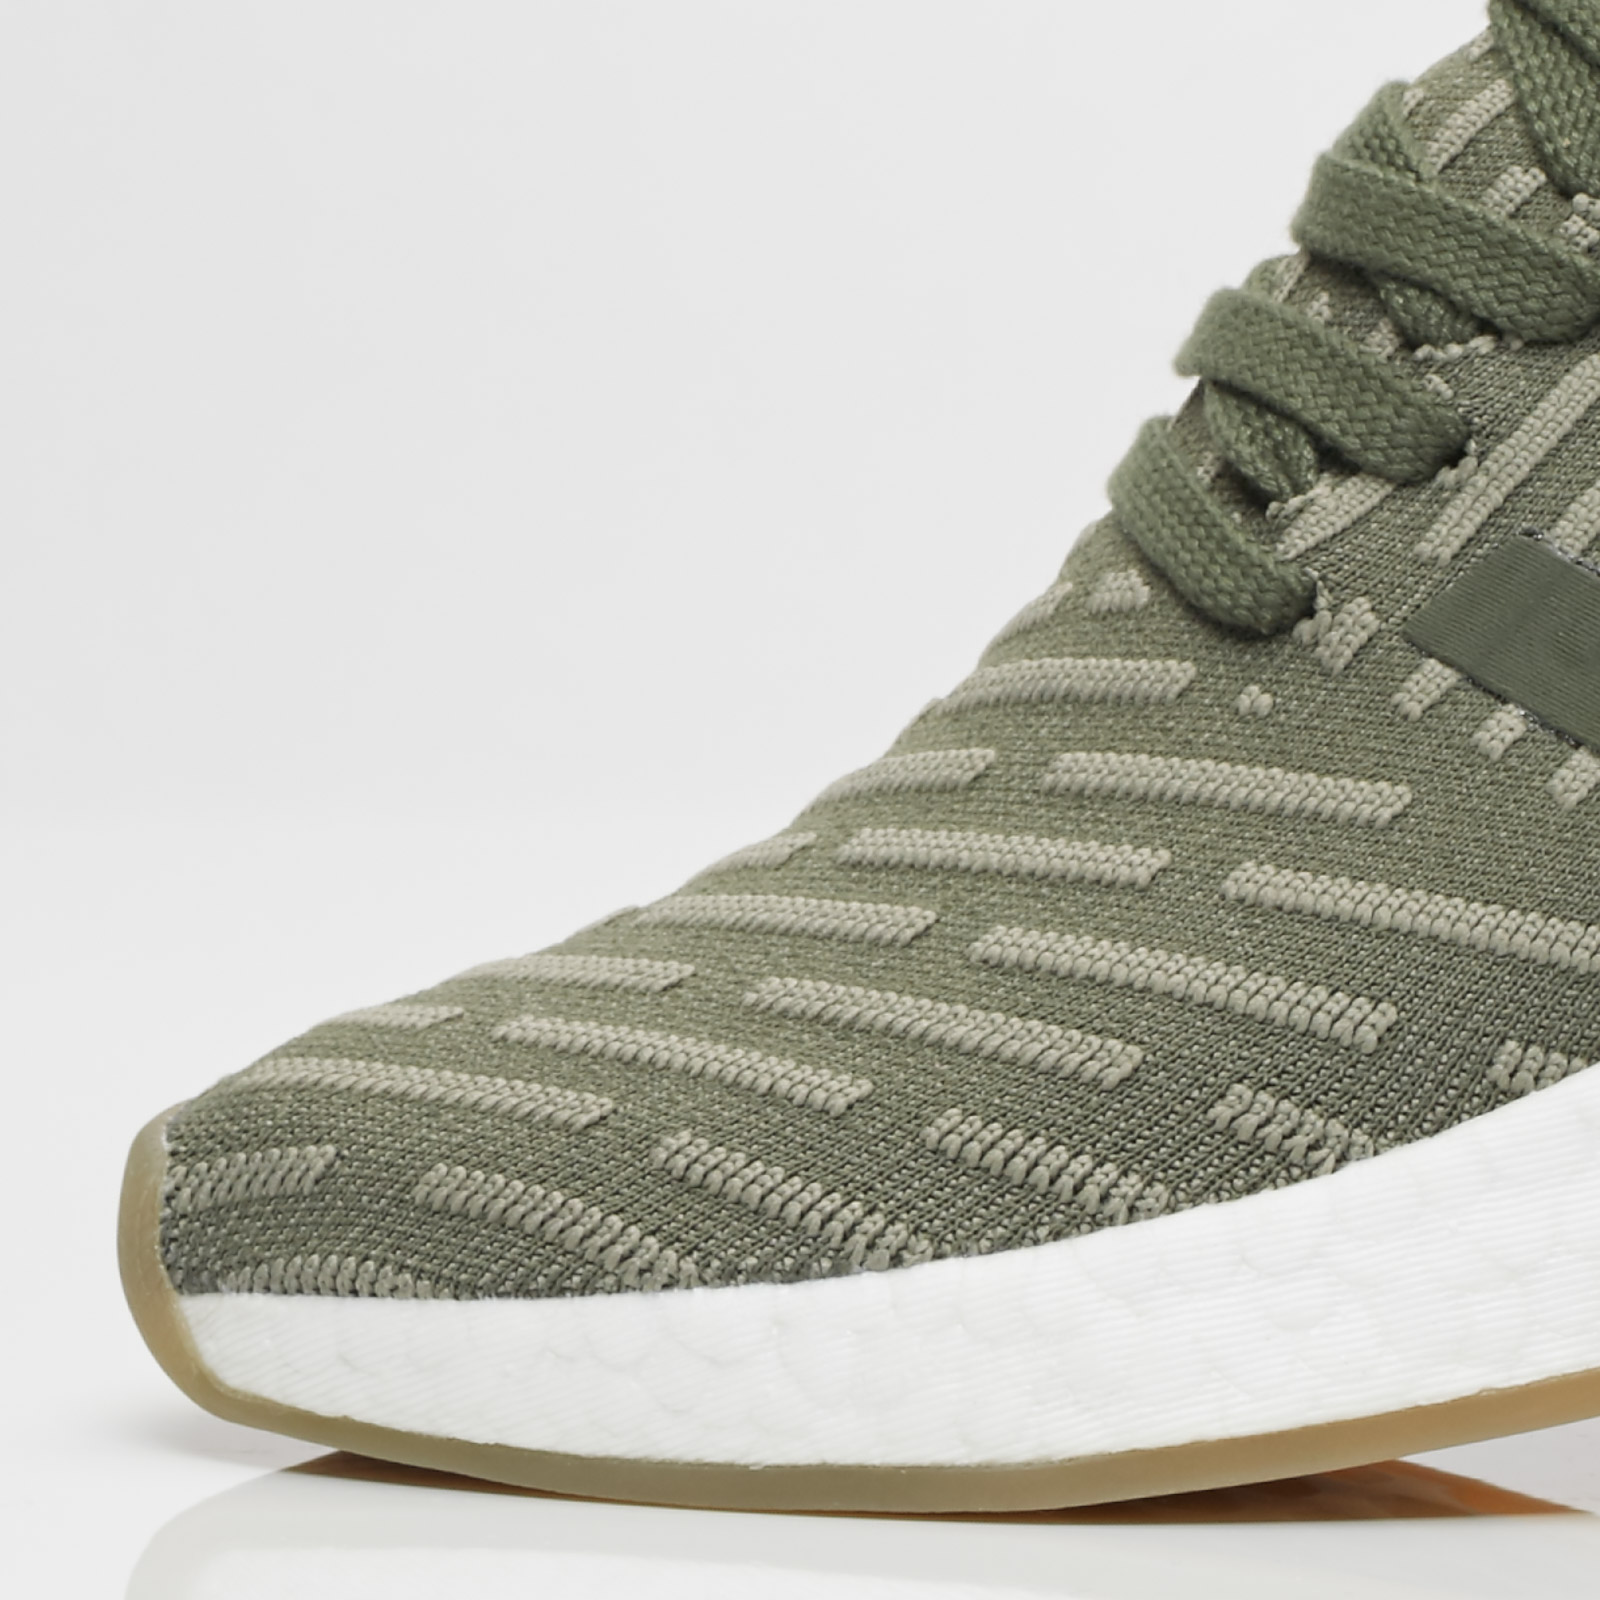 9c027c560 adidas NMD R2 PK W - By9953 - Sneakersnstuff